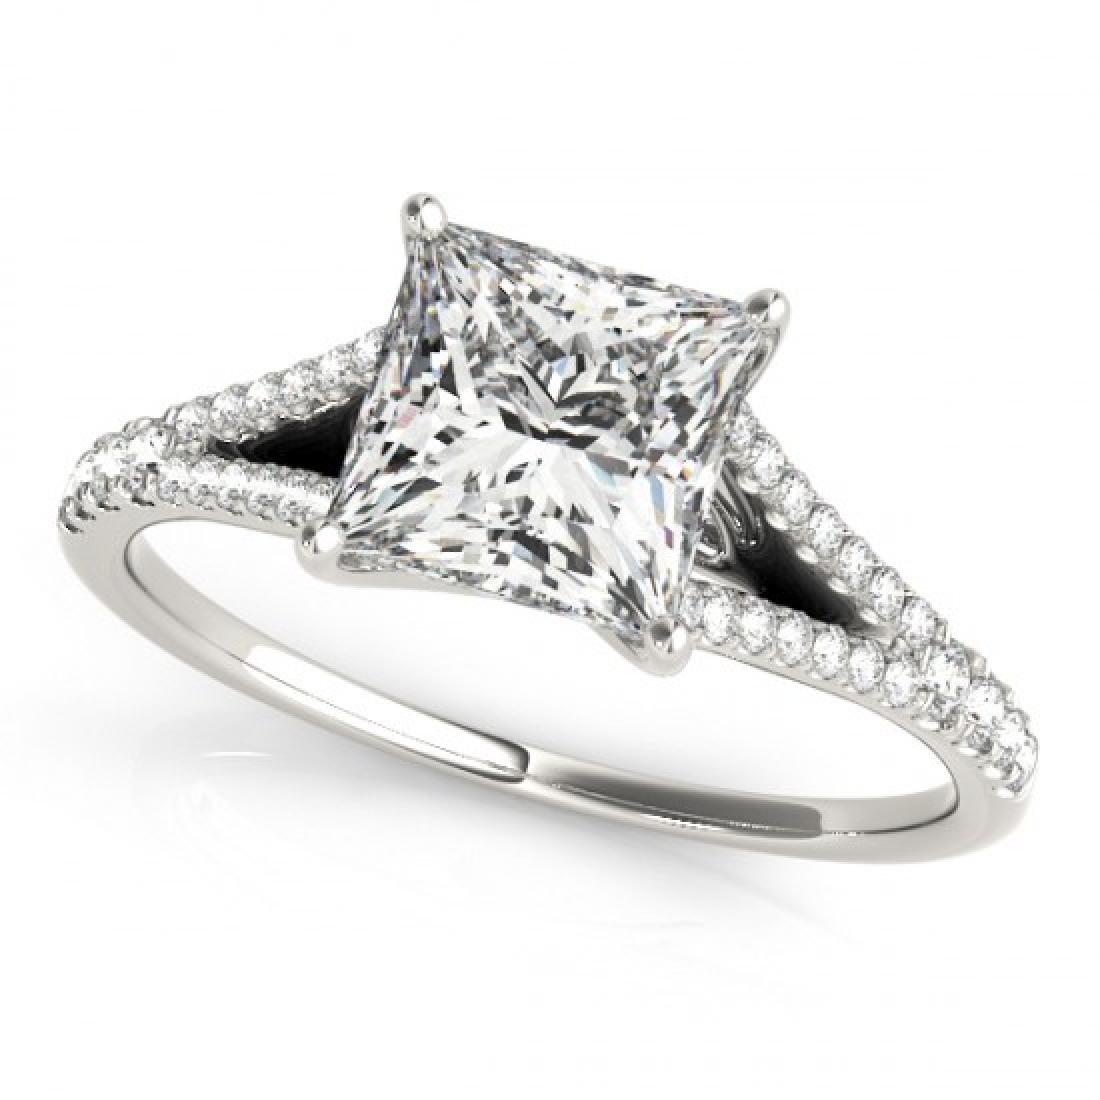 1.31 CTW Certified VS/SI Princess Diamond Solitaire